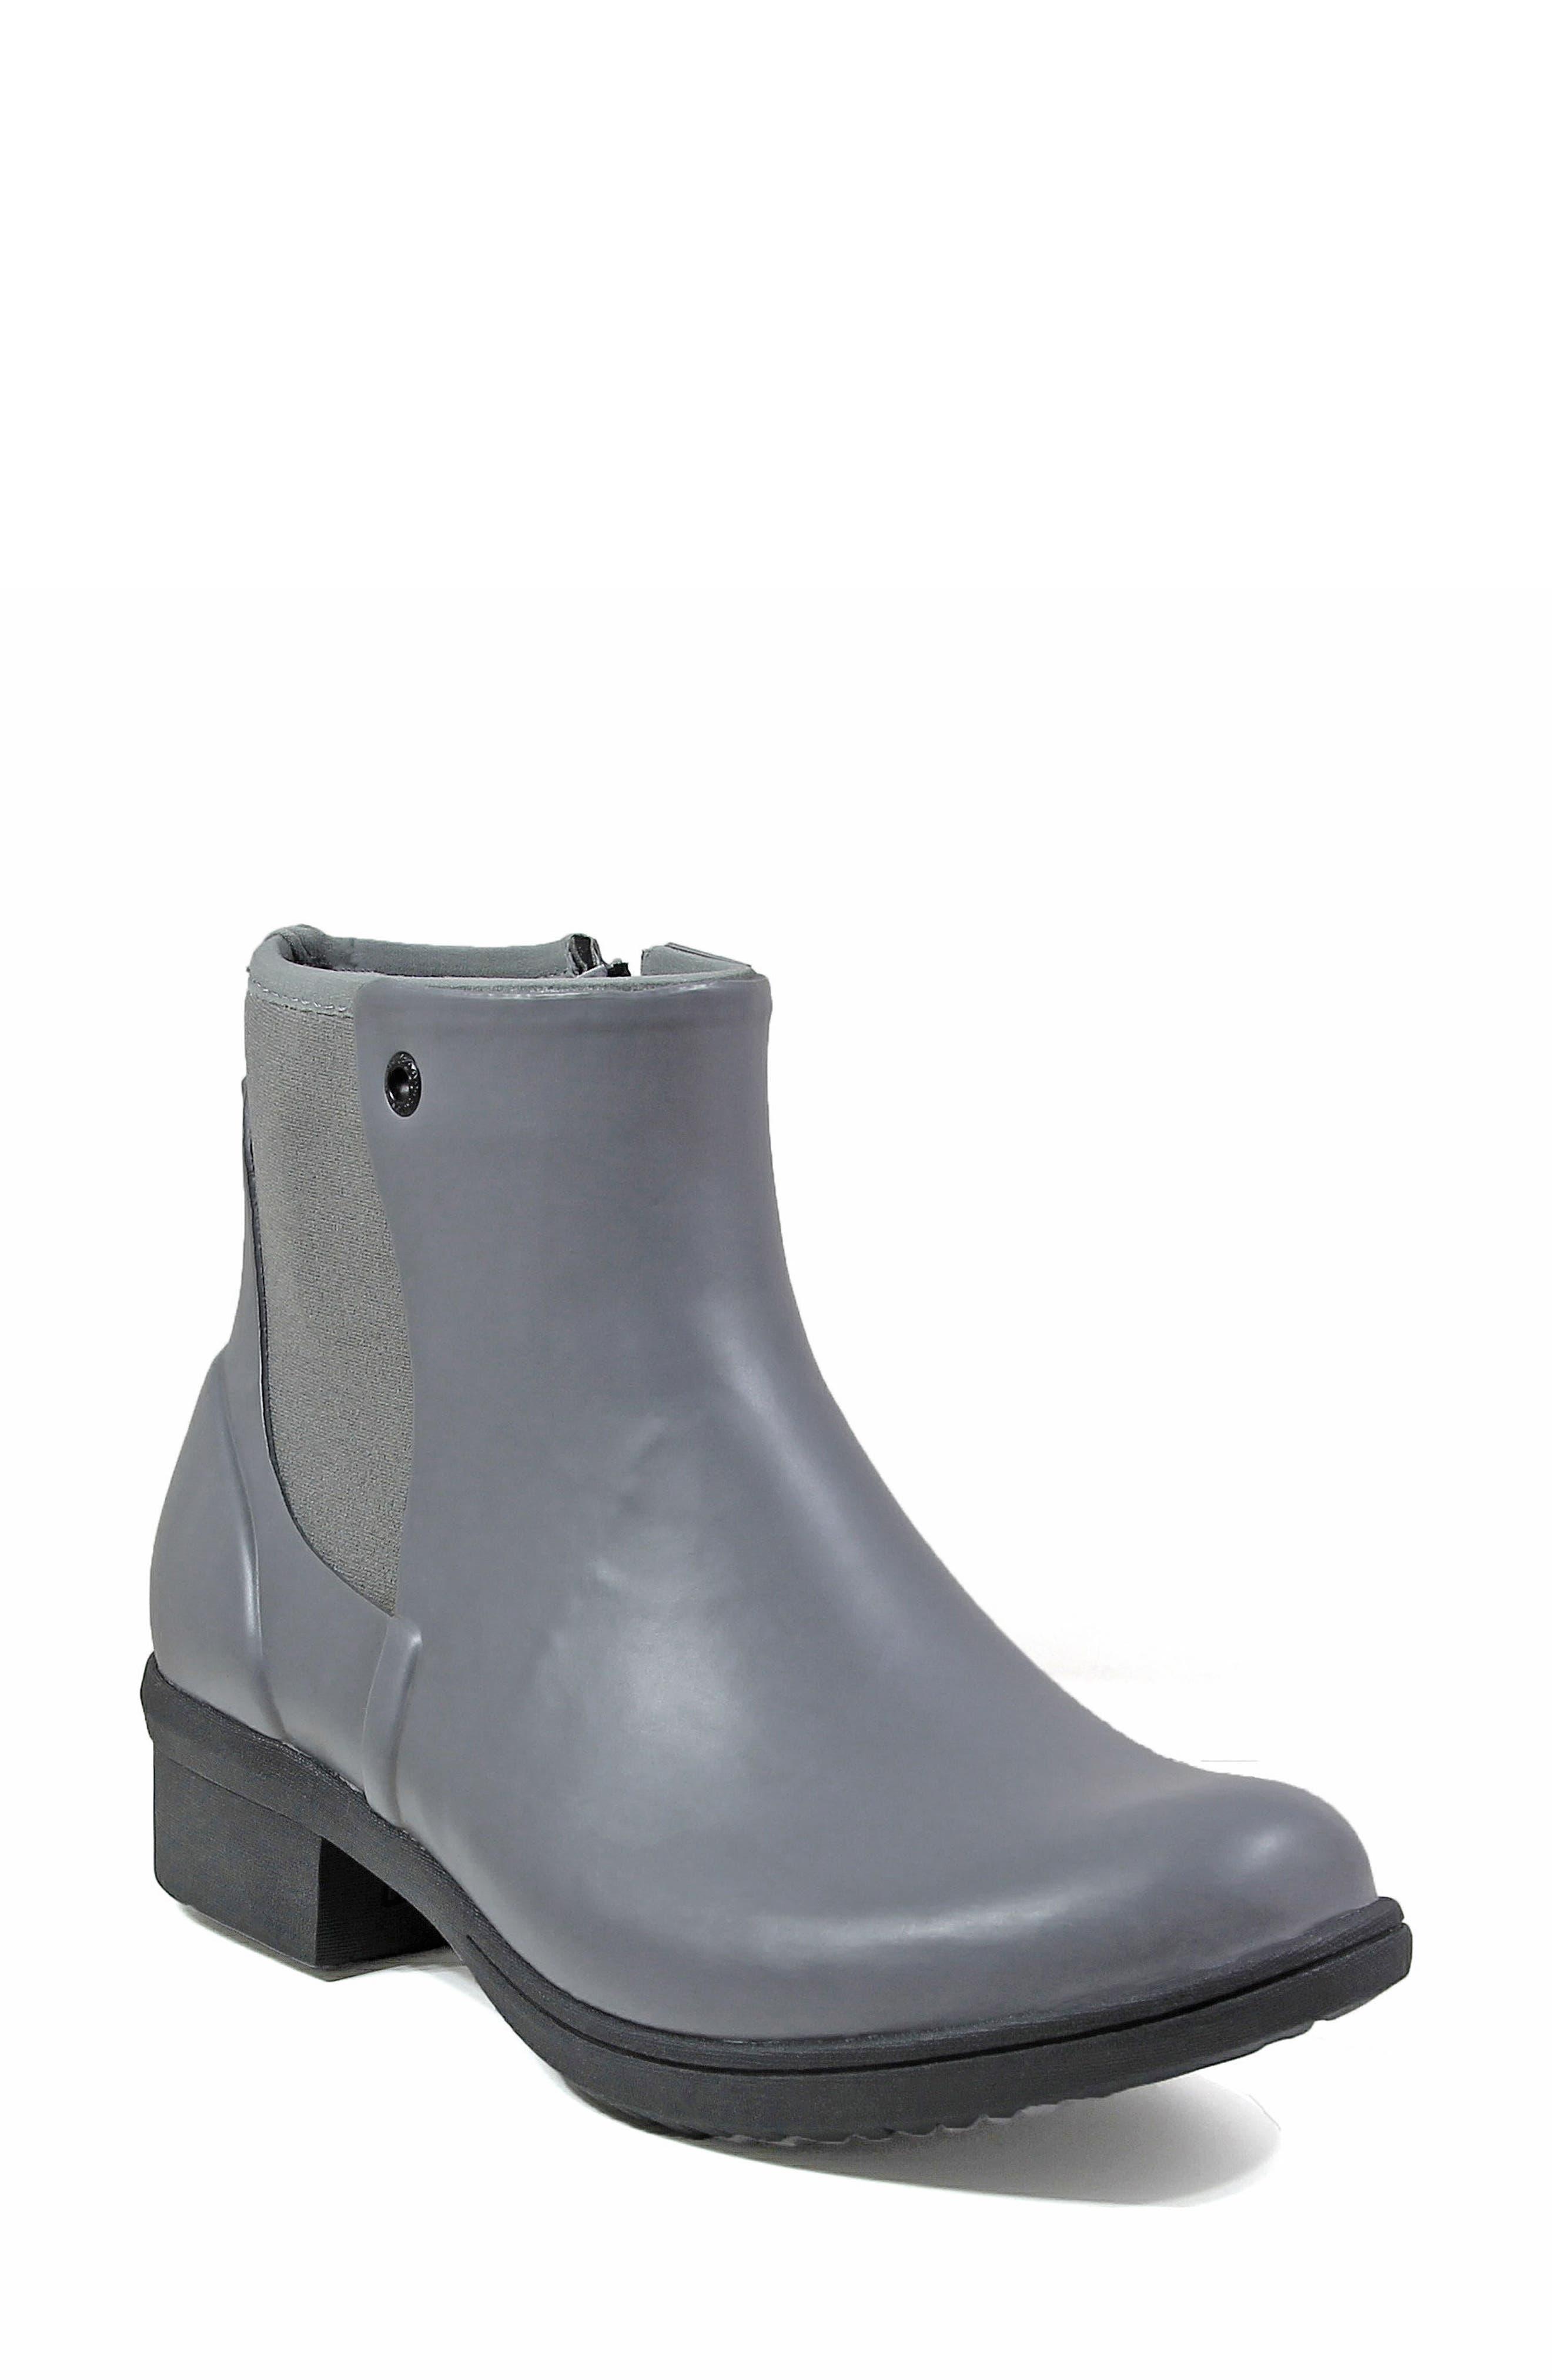 Alternate Image 1 Selected - BOGS Auburn Insulated Waterproof Boot (Women)